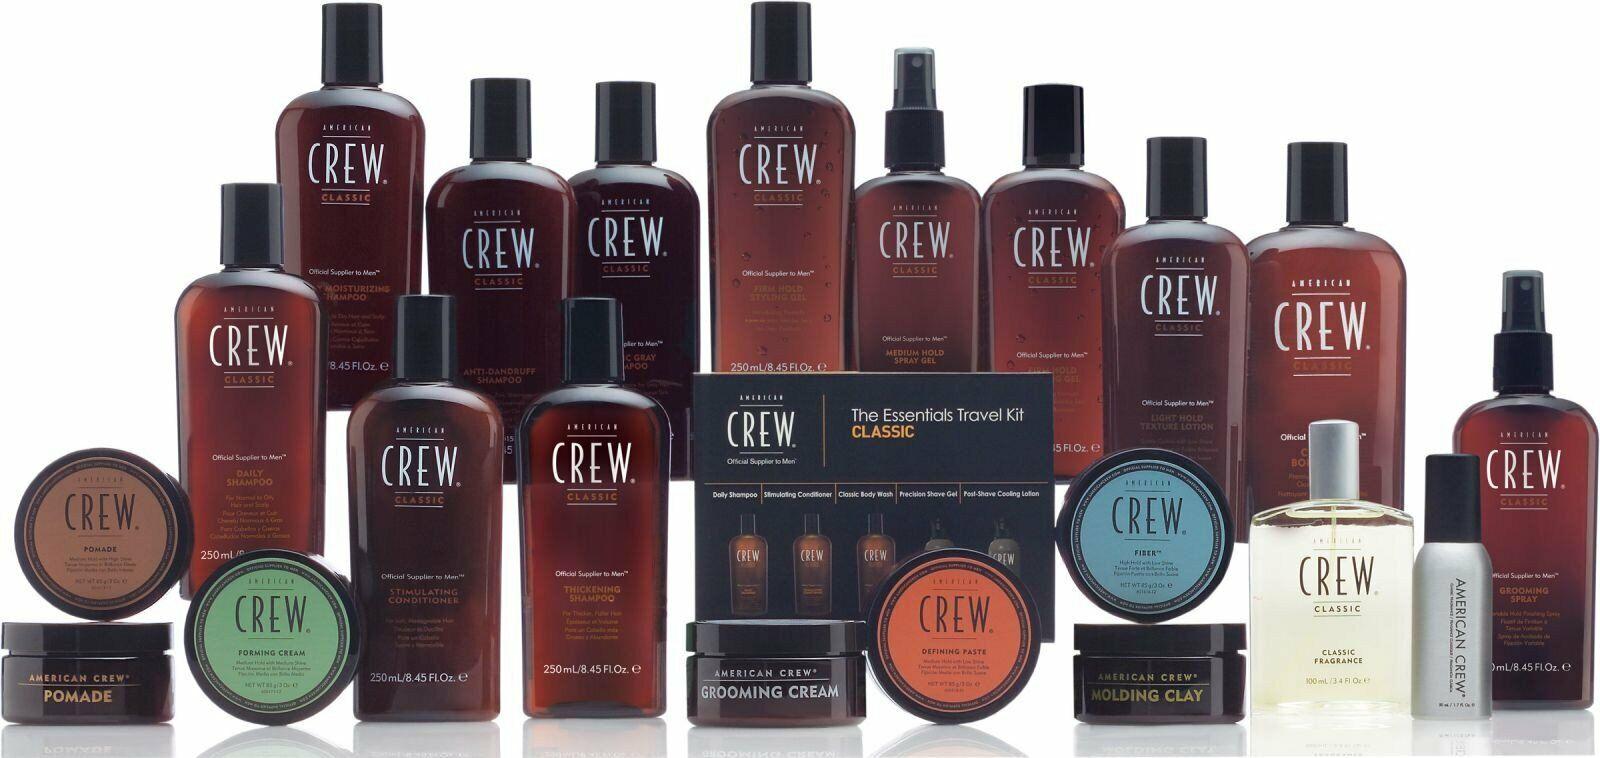 American Crew Pomade, Clay, Cream Paste - Shampoo  Choose Yo